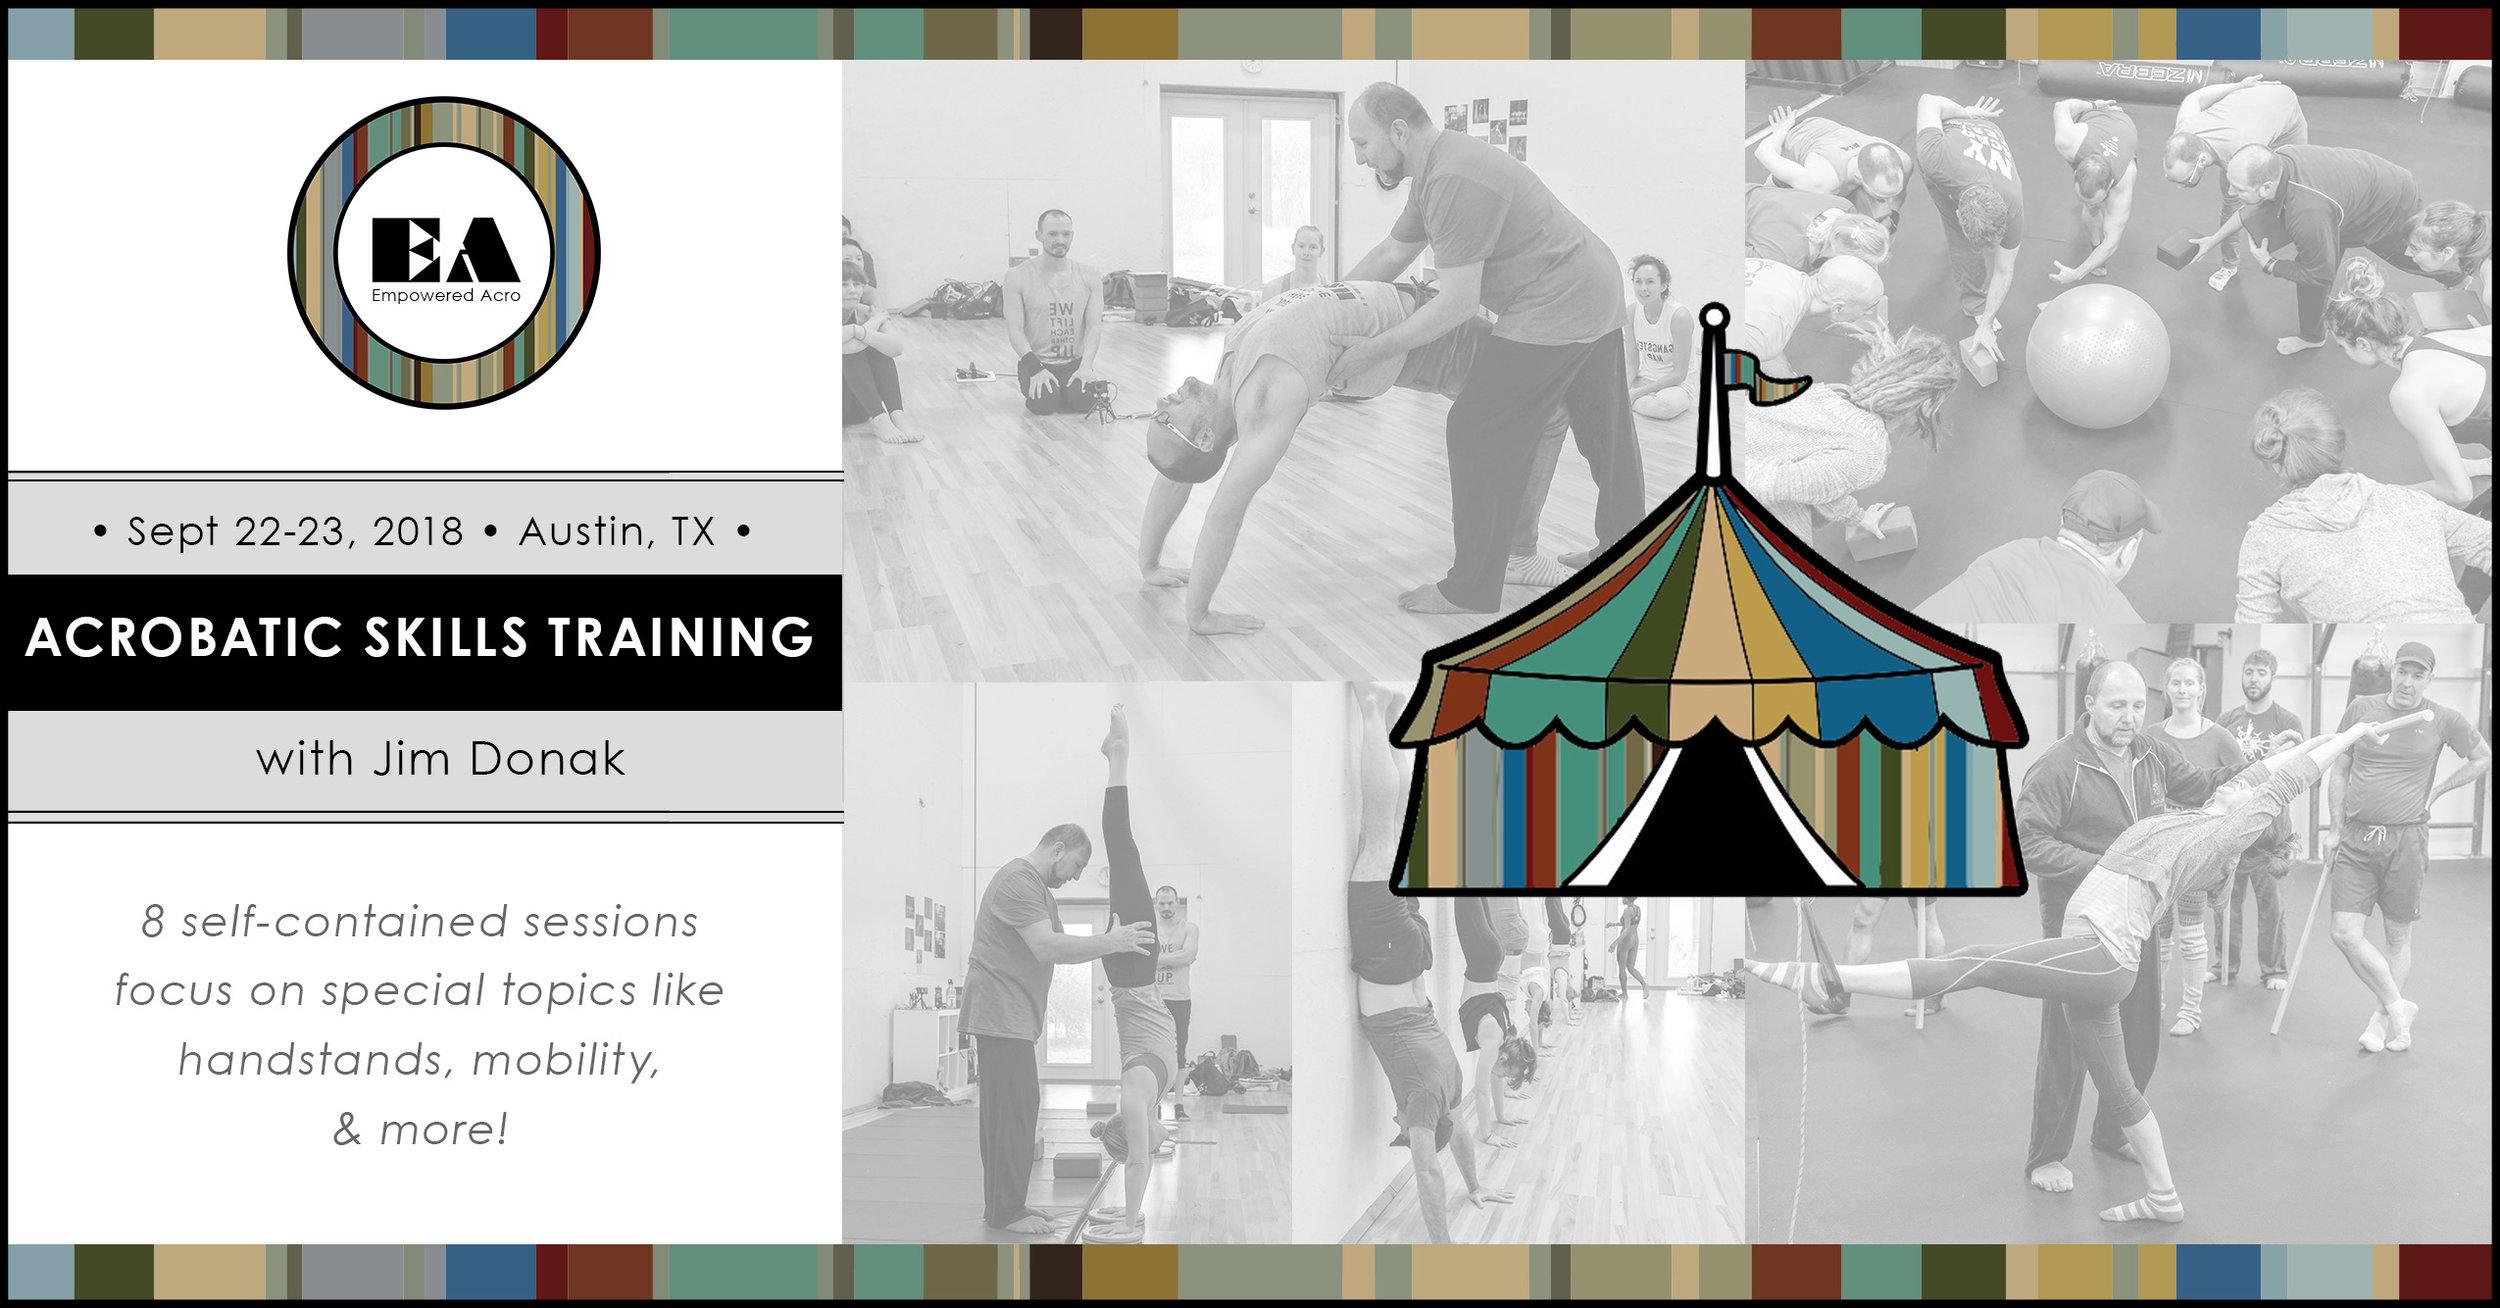 2018-09 acrobatic skills training banner.jpg